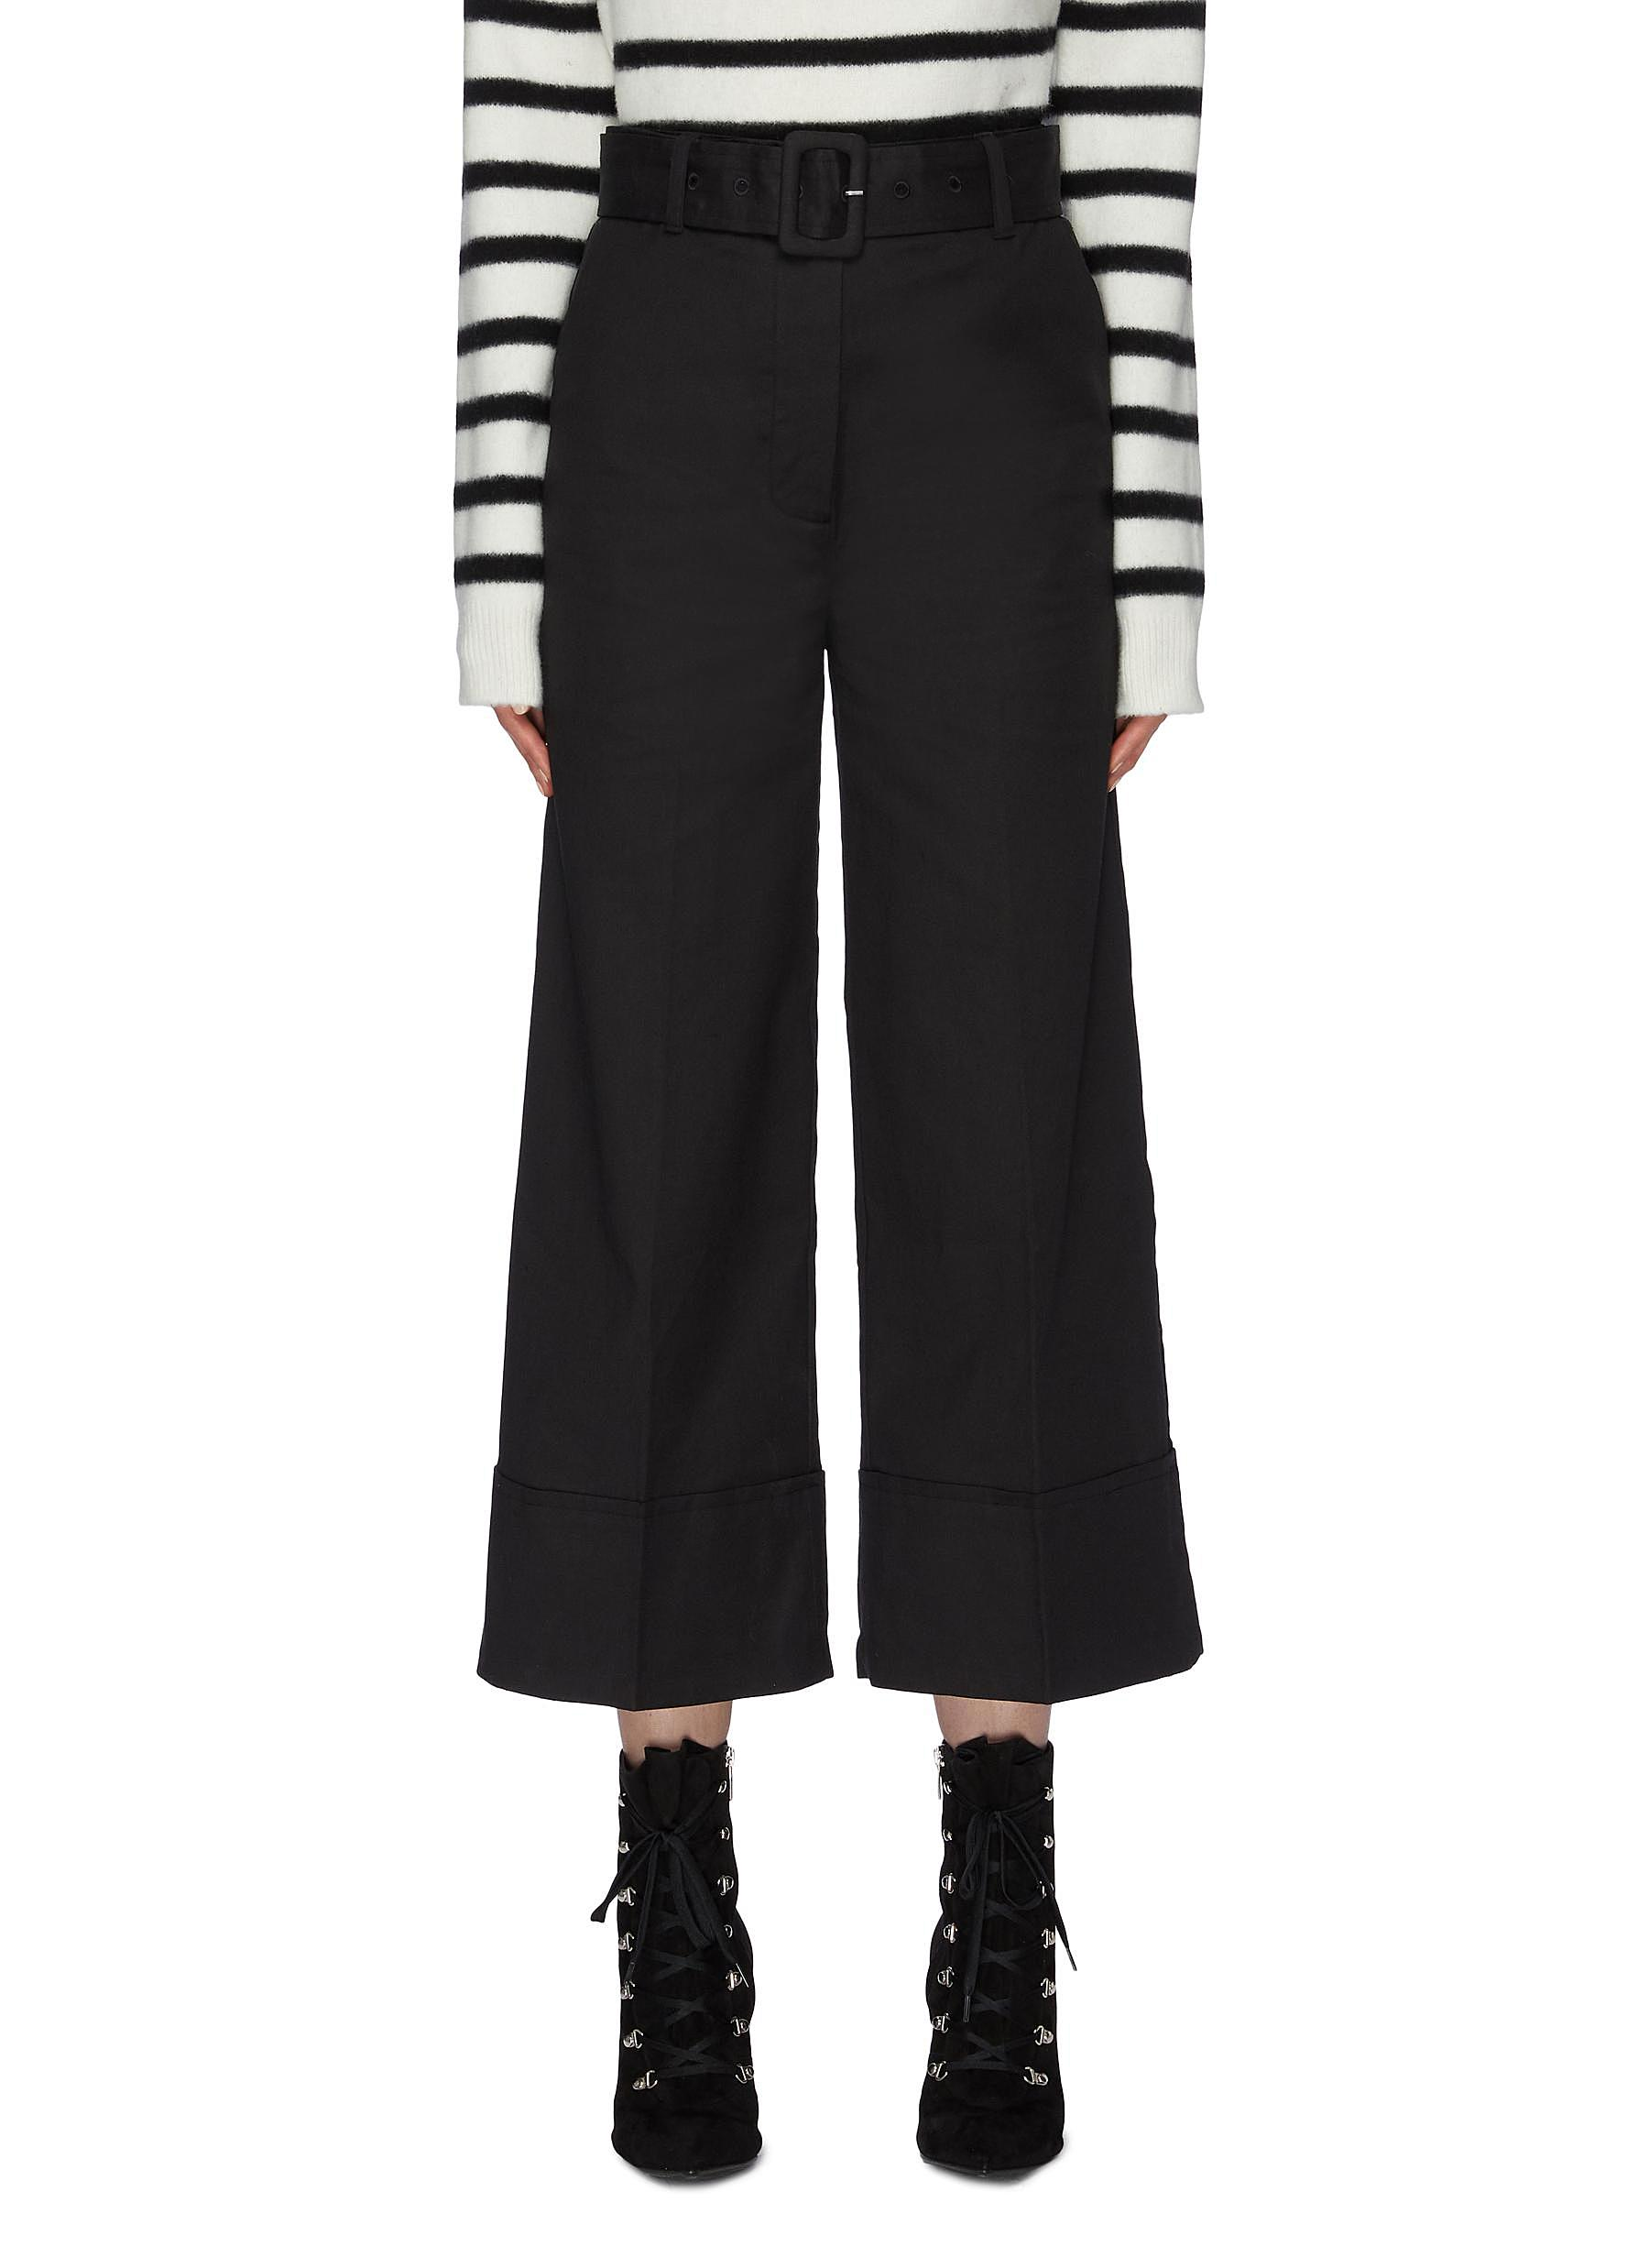 Belted rolled cuff denim wide leg pants by Frame Denim